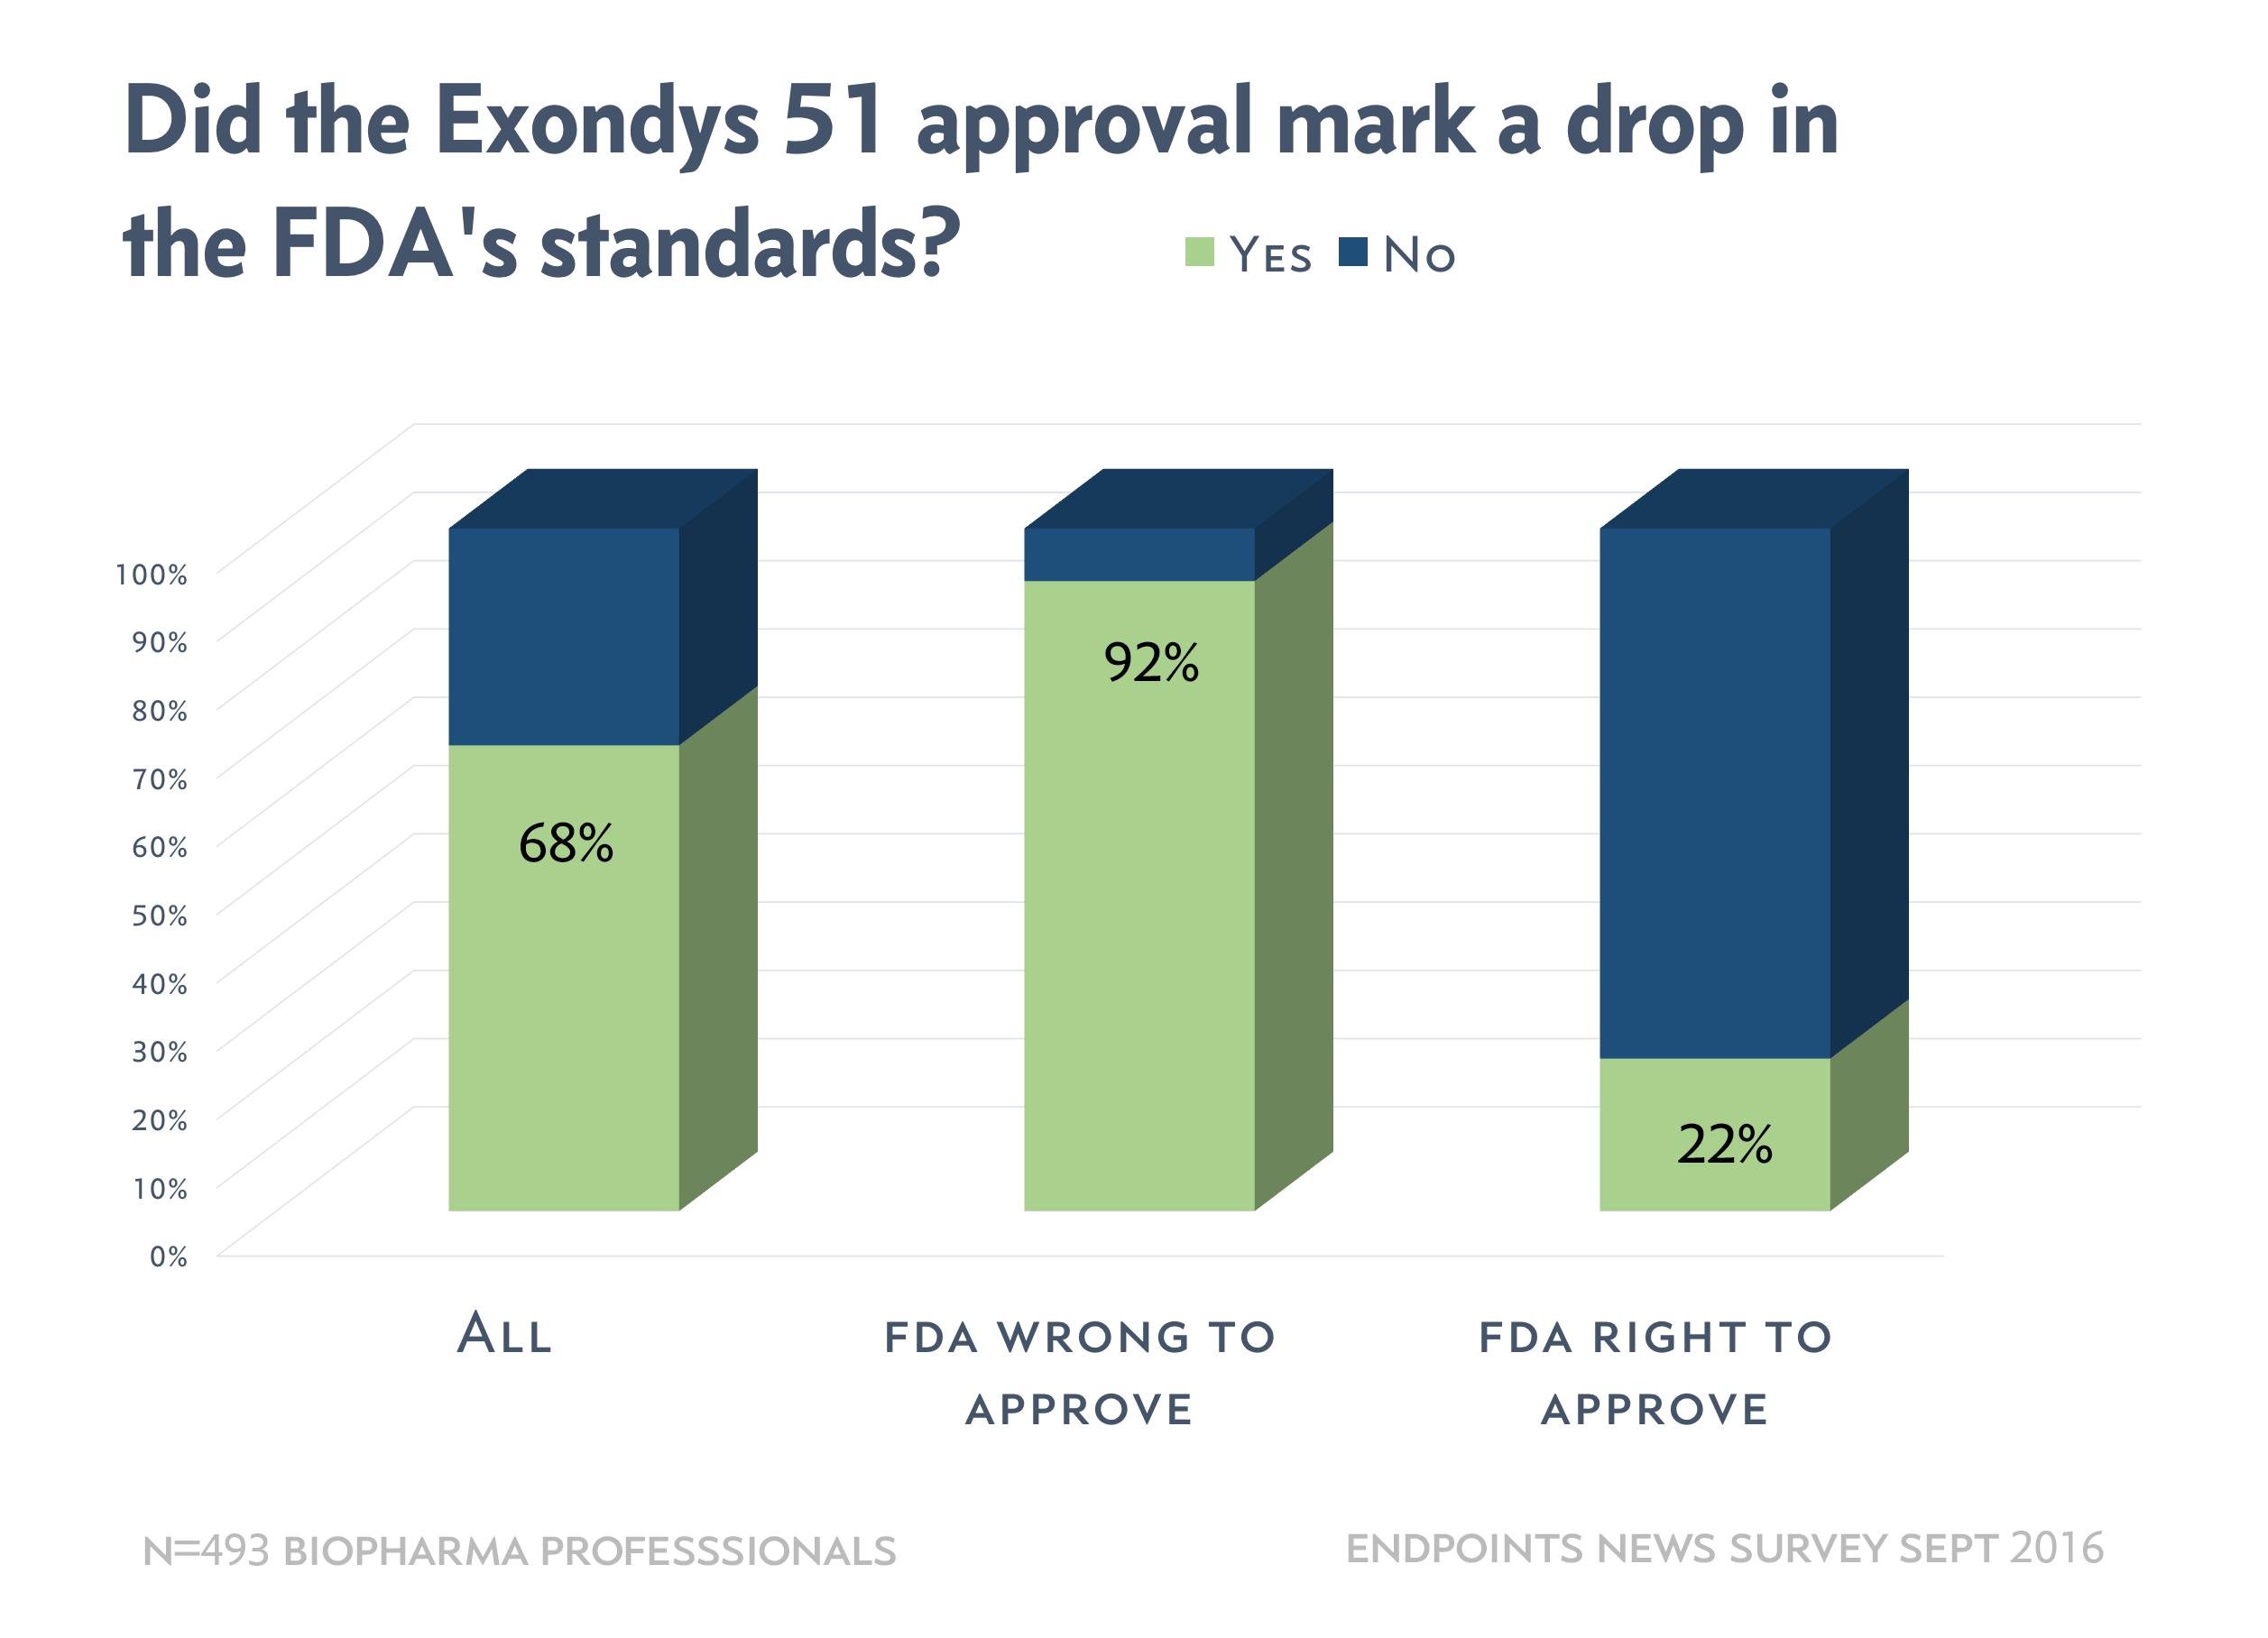 FDA standards lowered